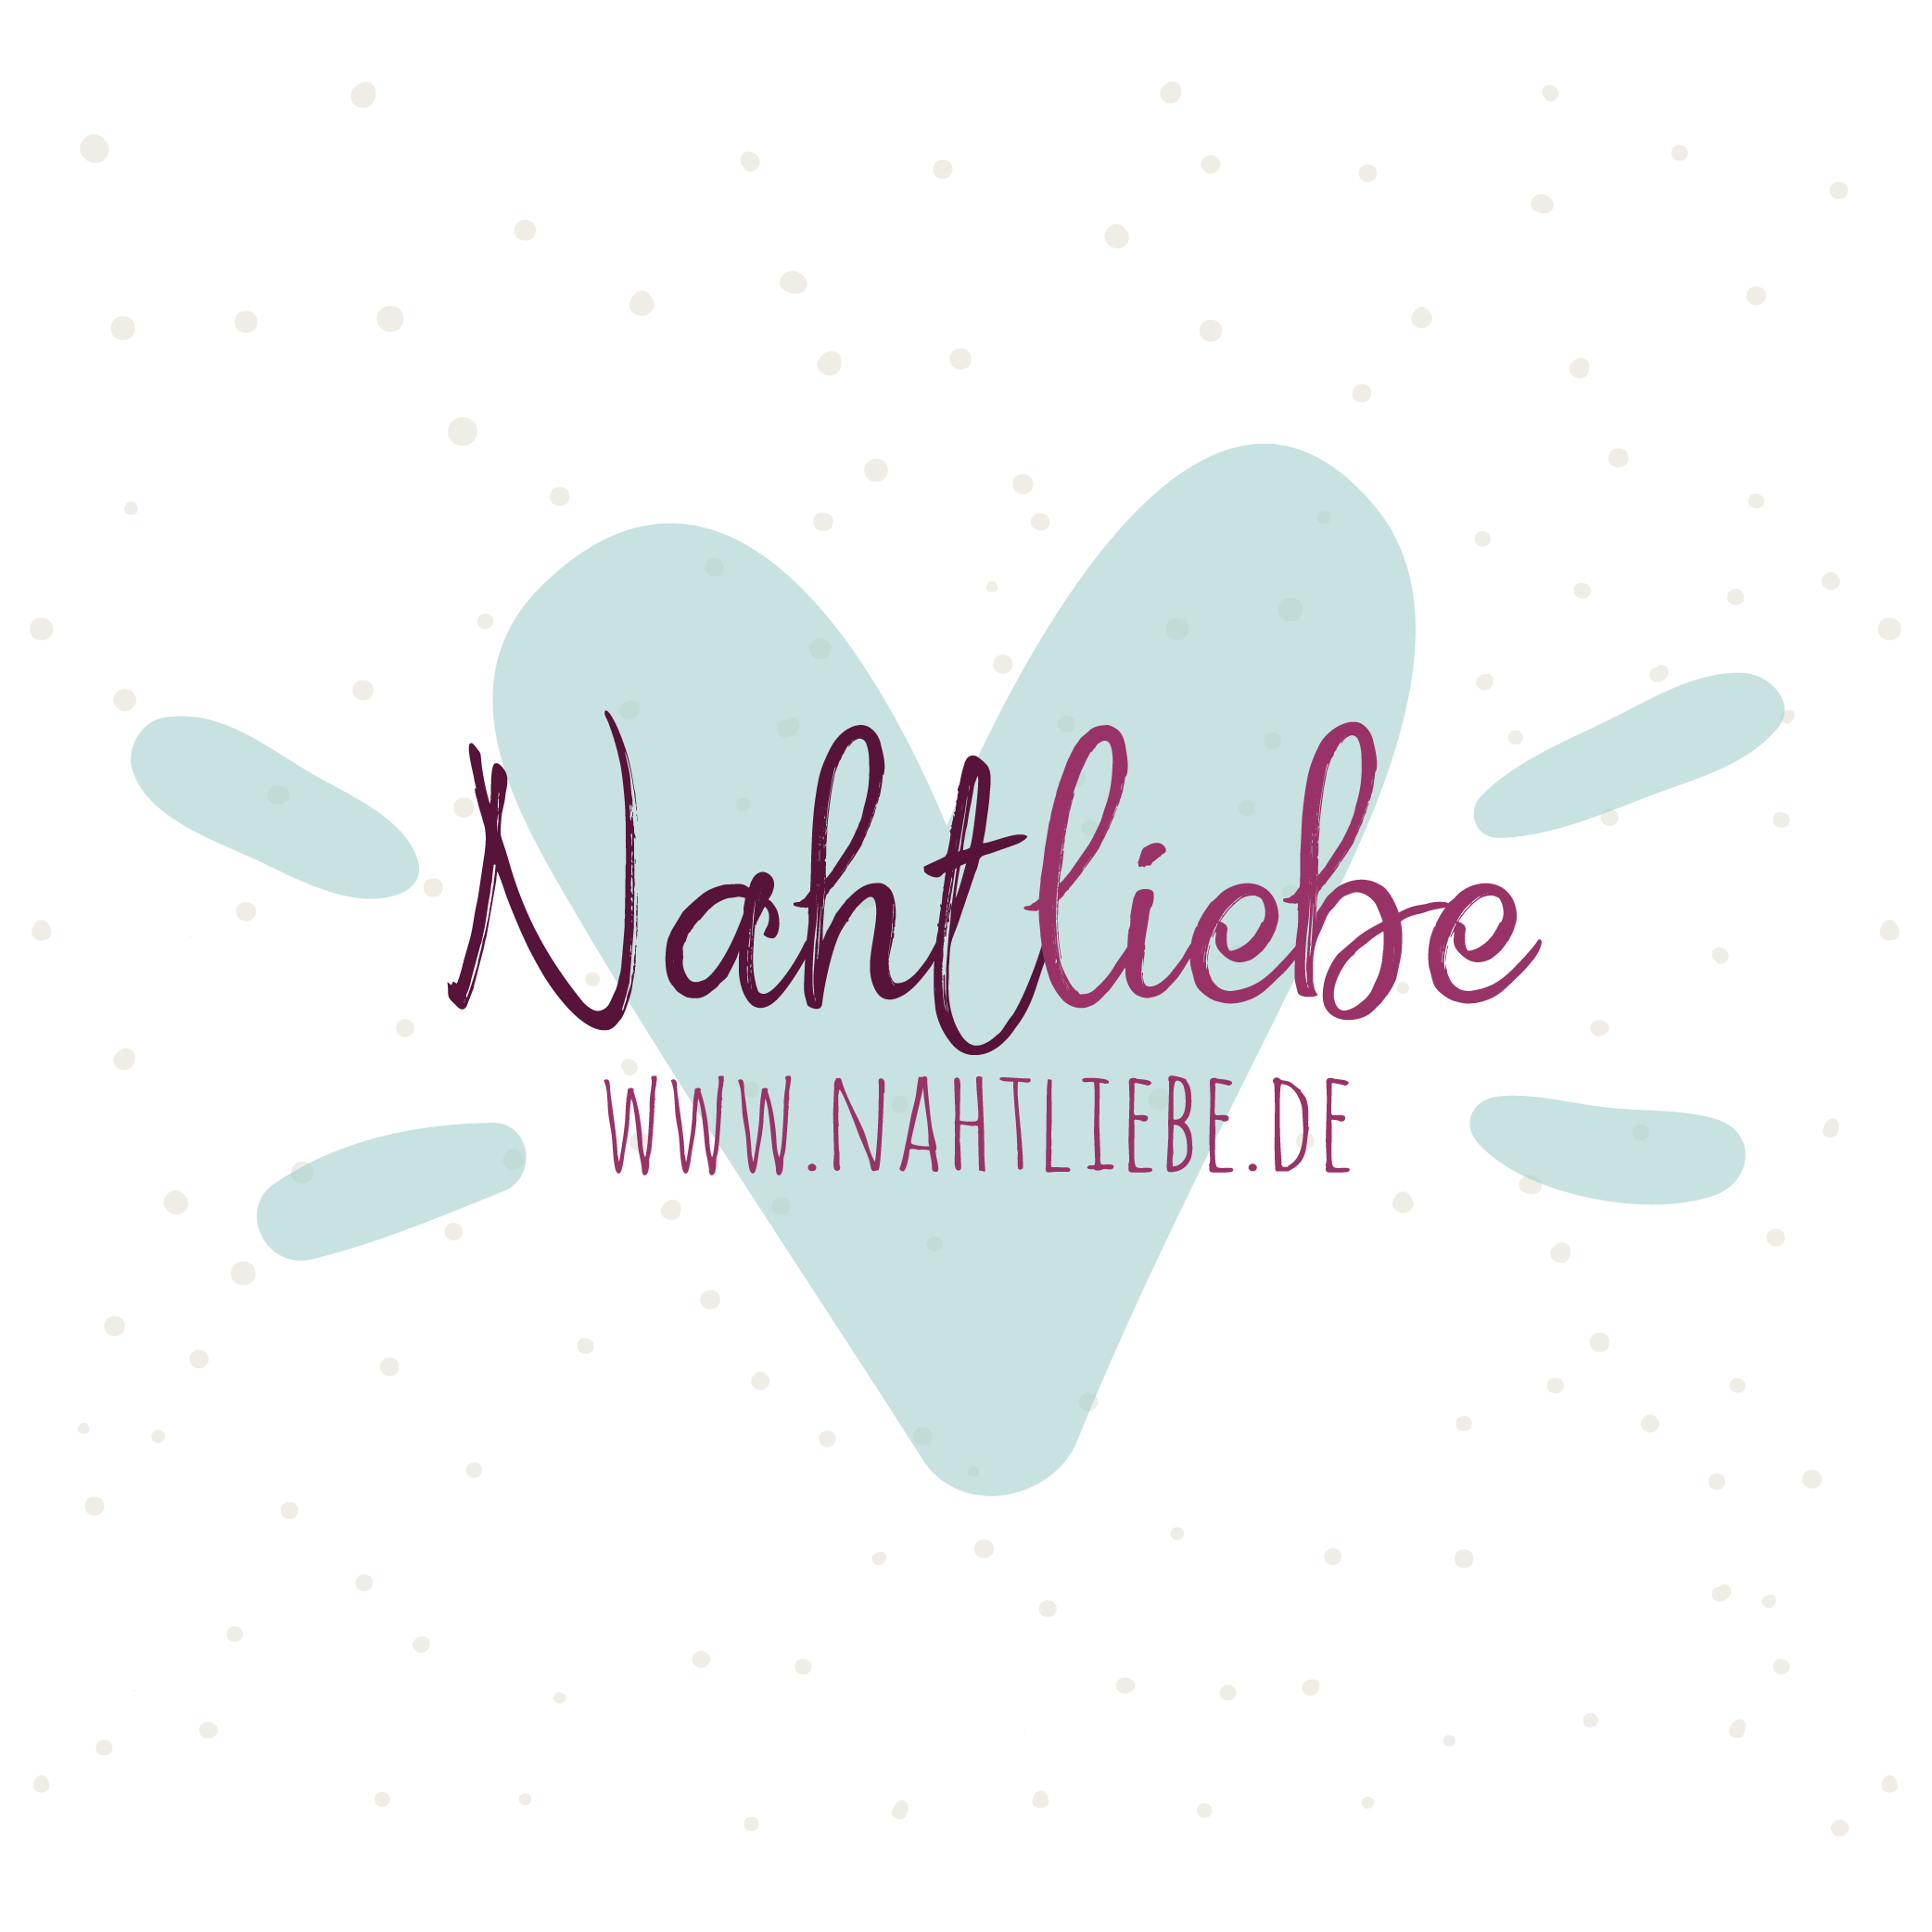 Logo_Nahtliebe-03